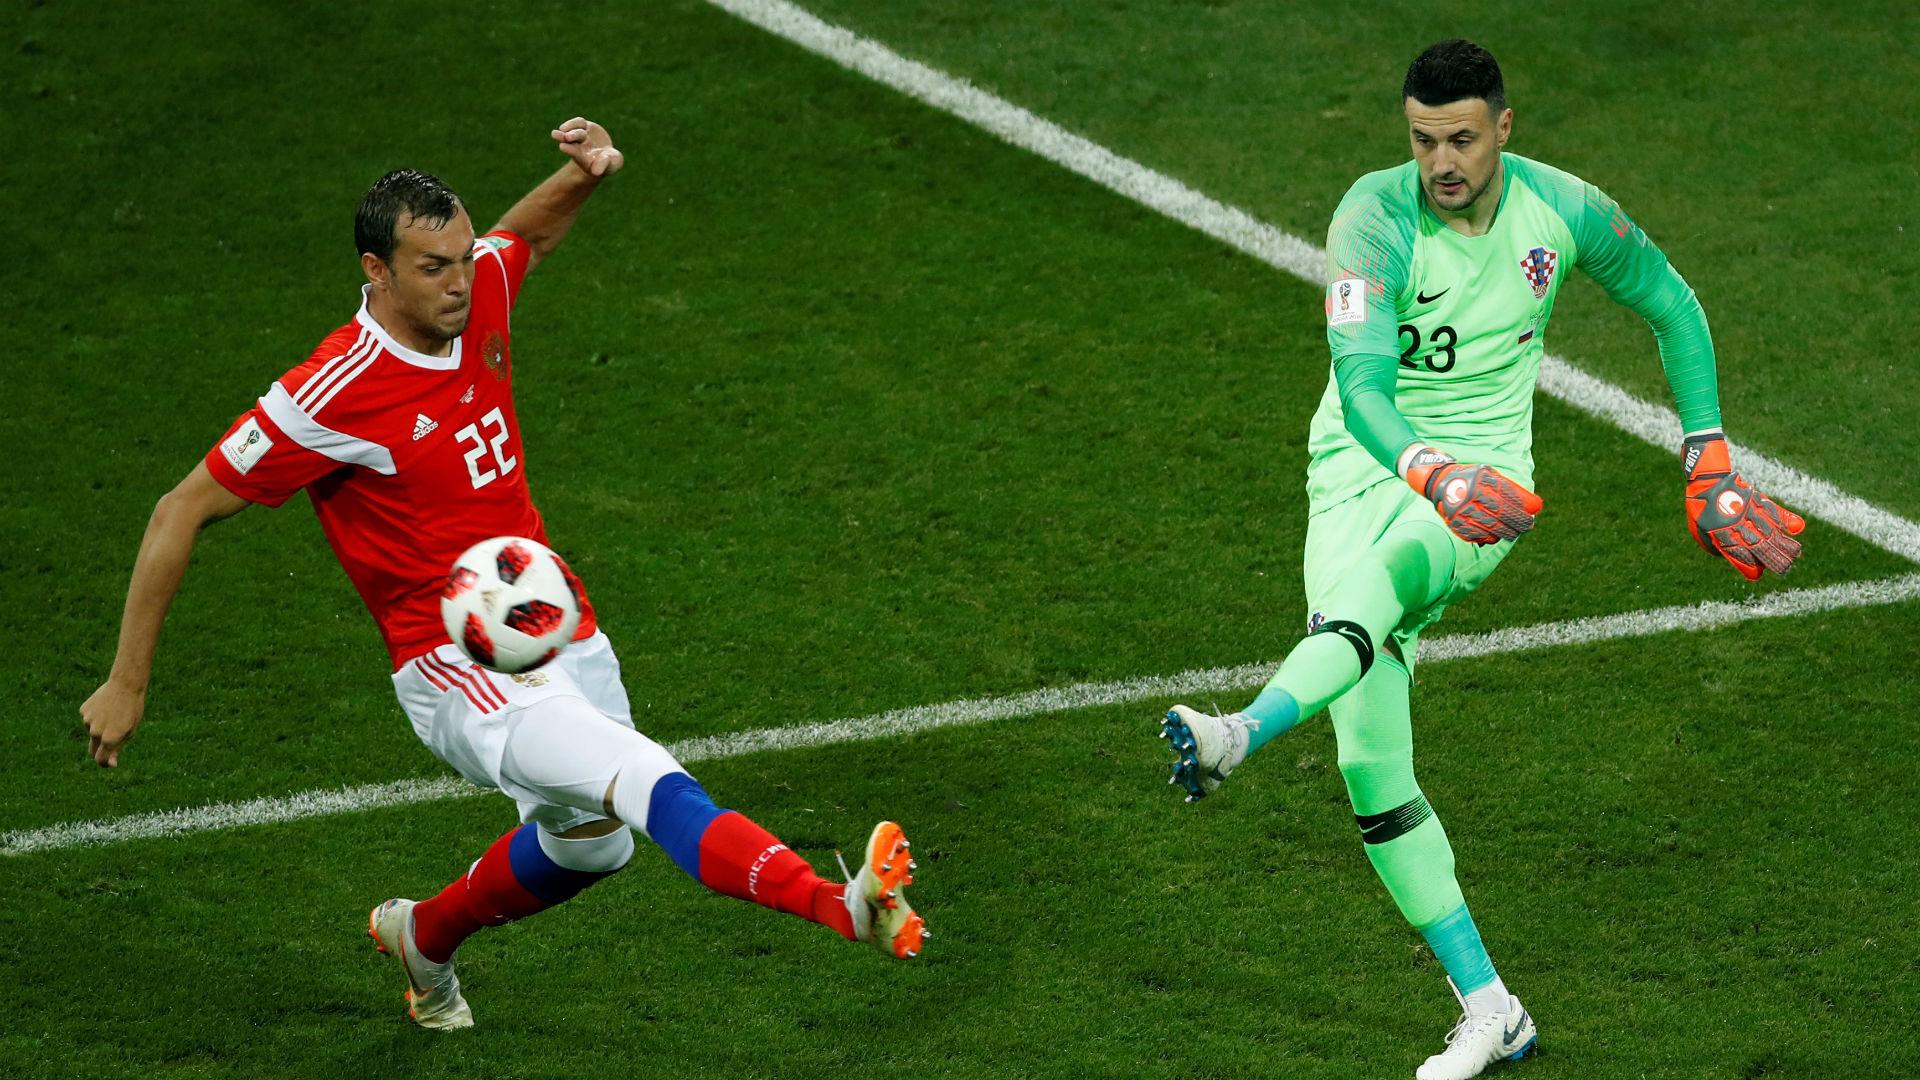 russia croatia - danijel subasic artem dzyuba - world cup - 07072018